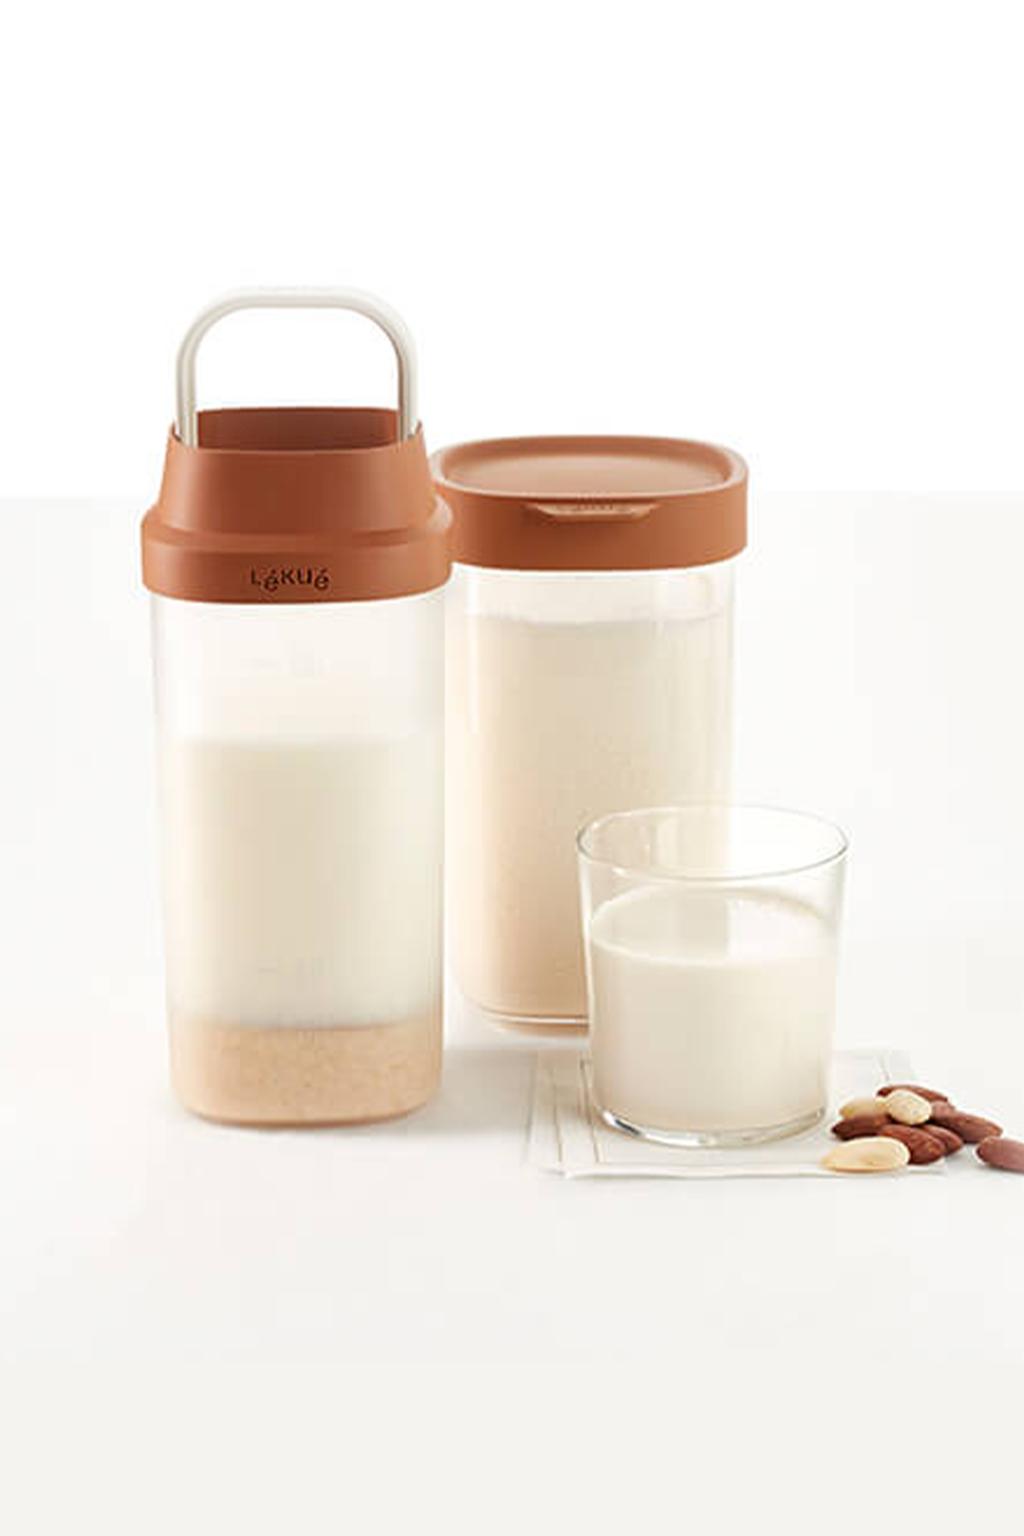 Nut And Grain Milk Maker In 2020 Milk Makers Dairy Free Milk Bamboo Cups